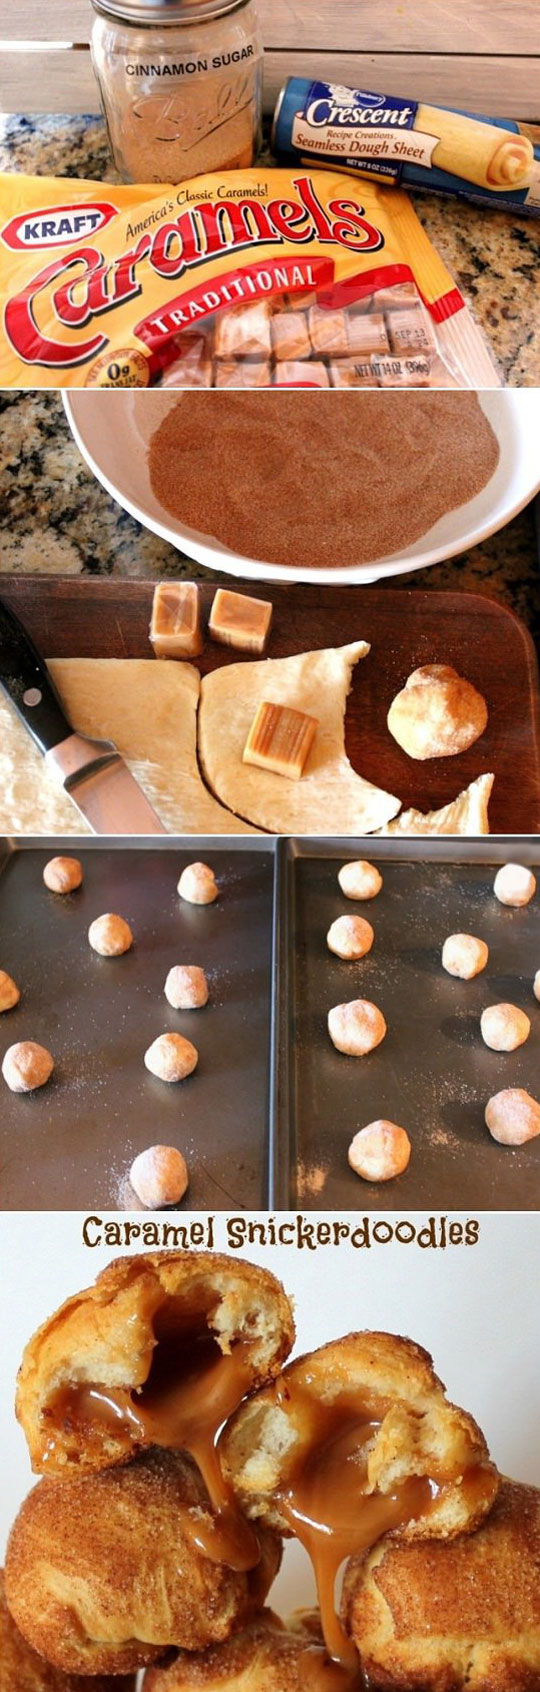 Caramel Snickerdoodles Recipe